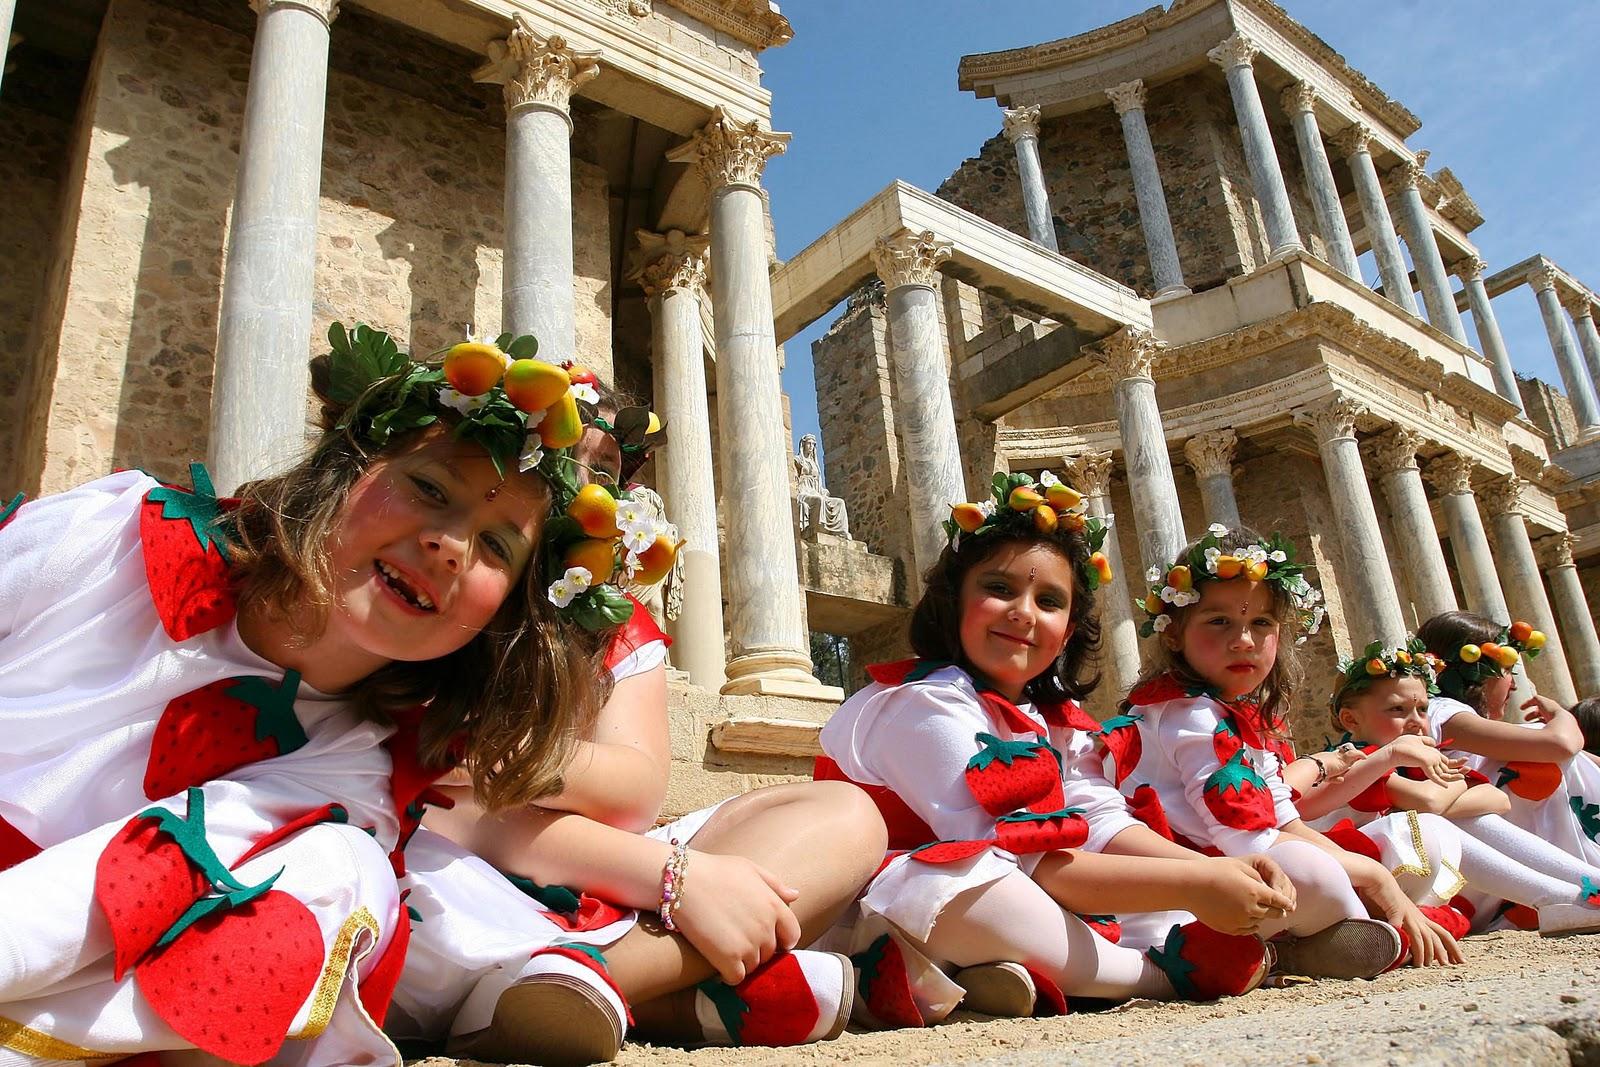 Matrimonio In Epoca Romana : Nómadas de hoy una boda teatro